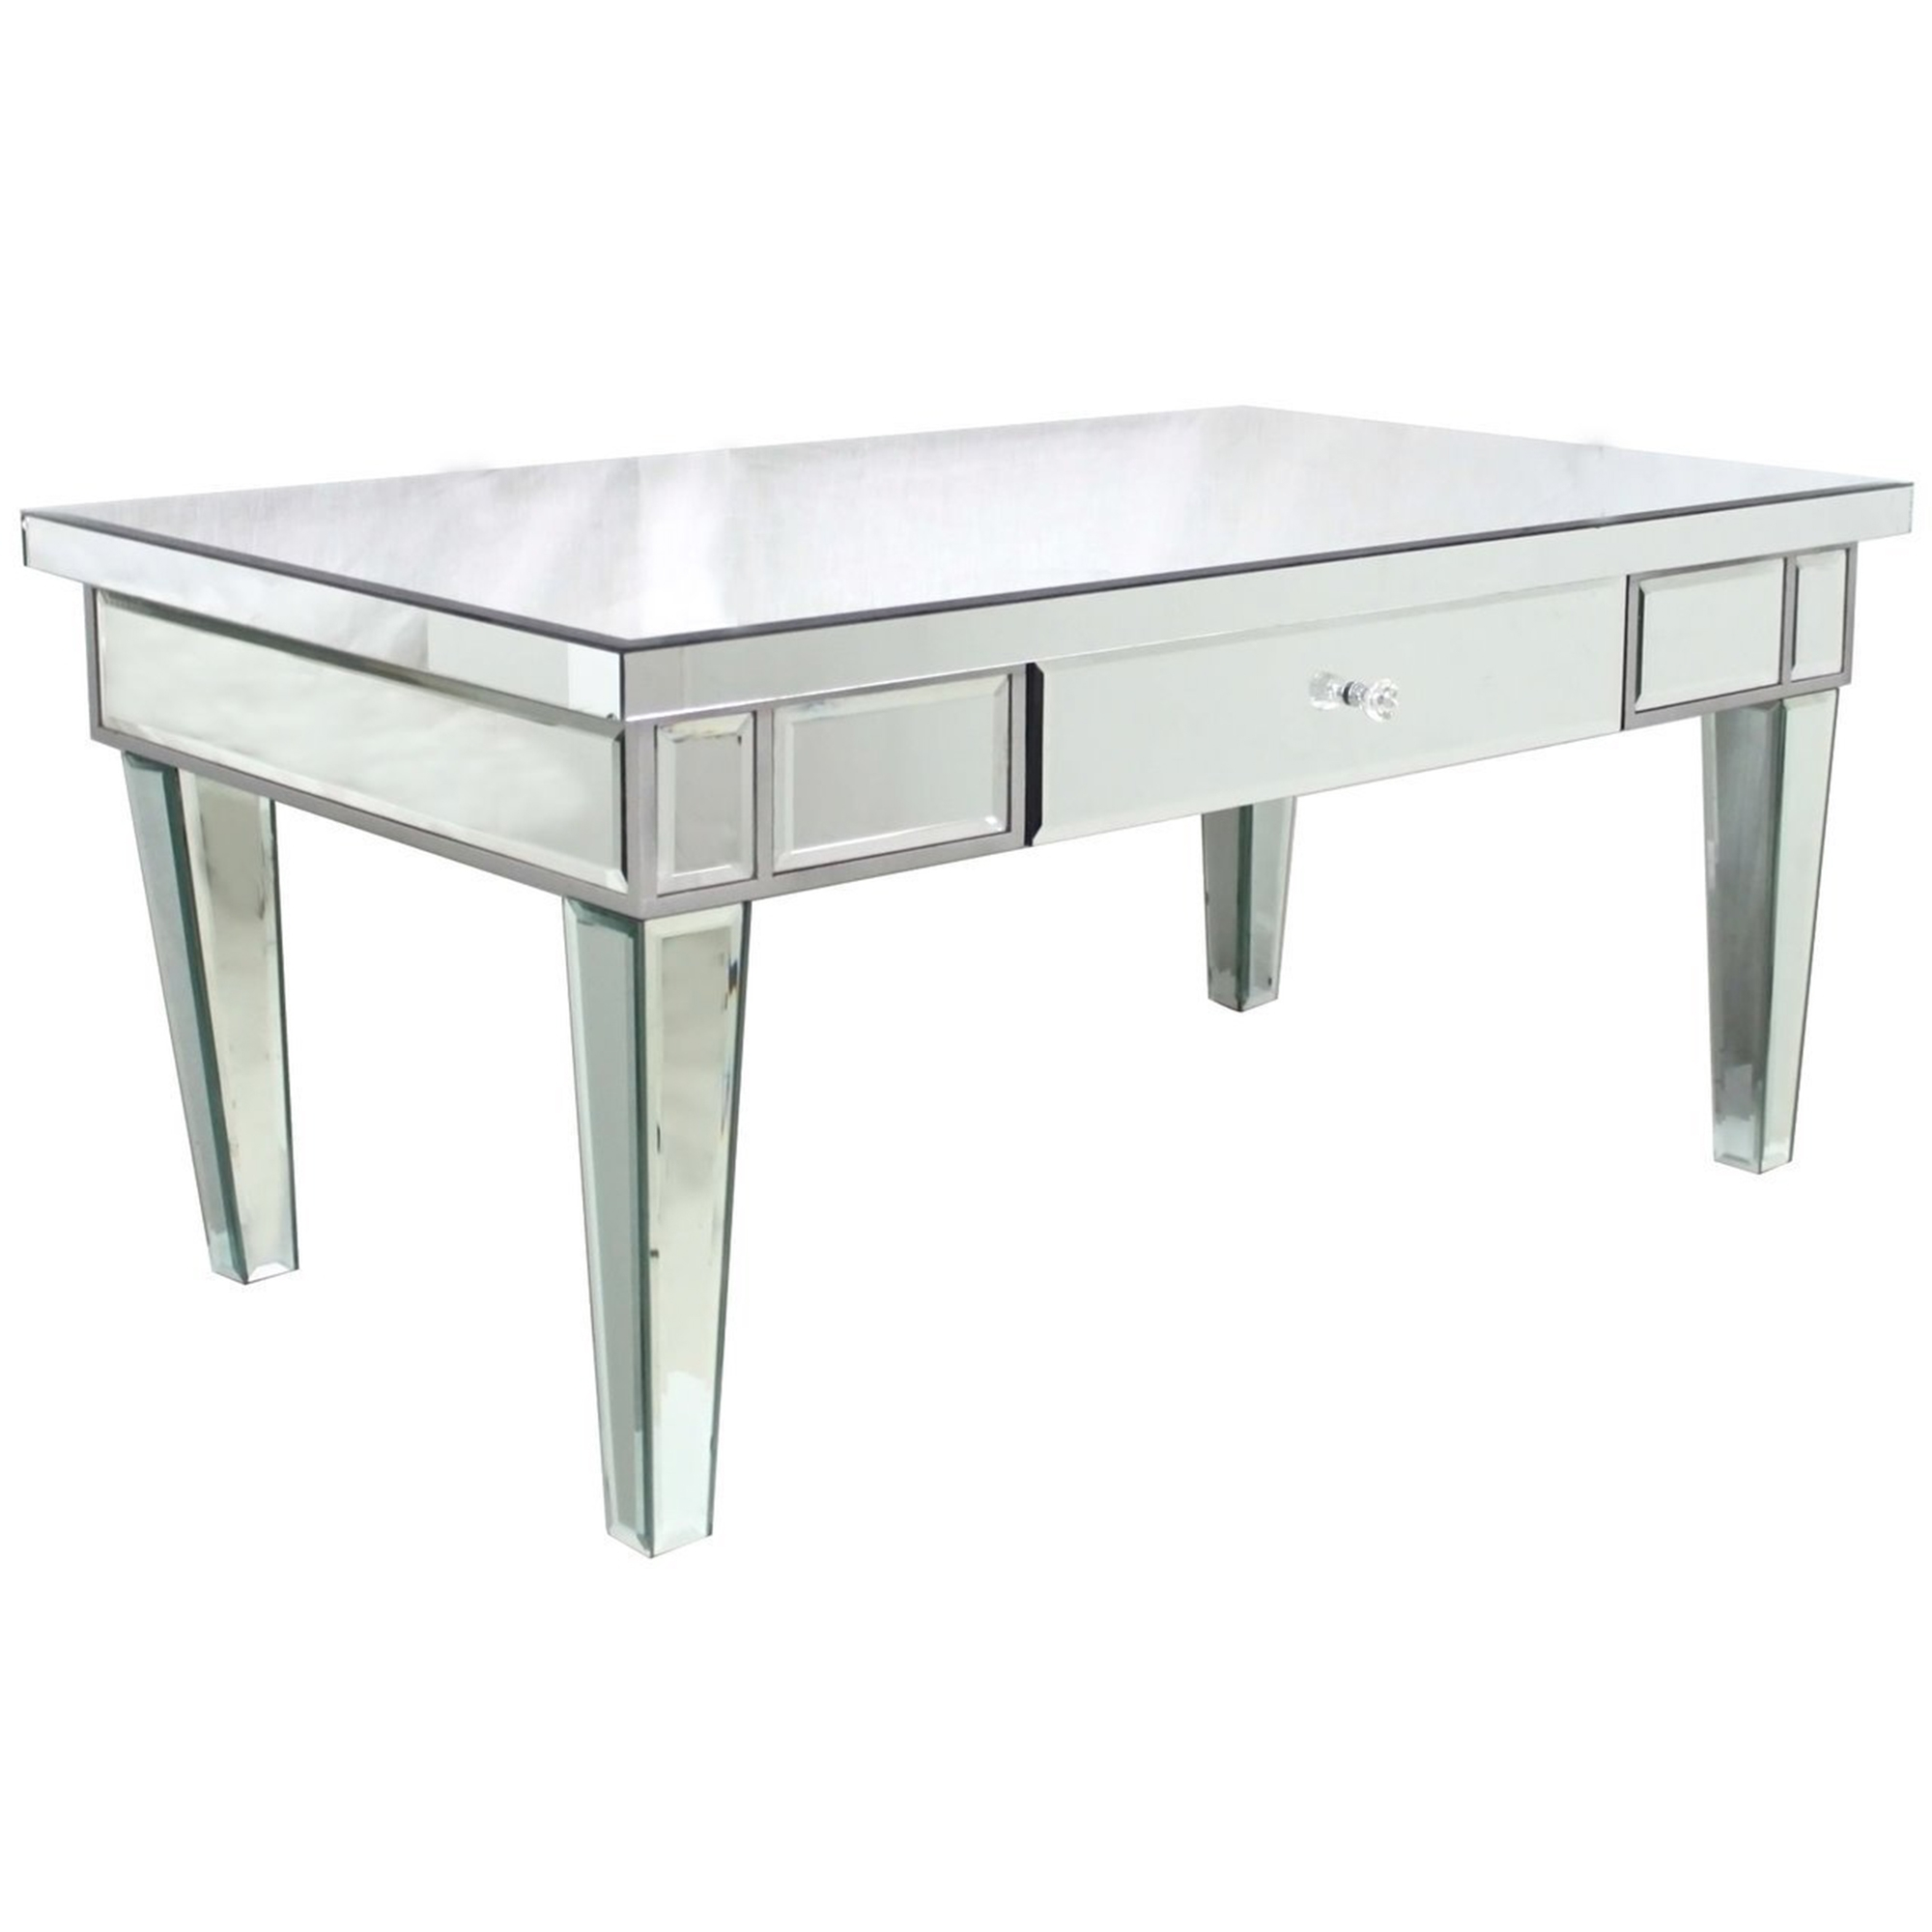 mirrored coffee table. Venetian Mirrored Coffee Table